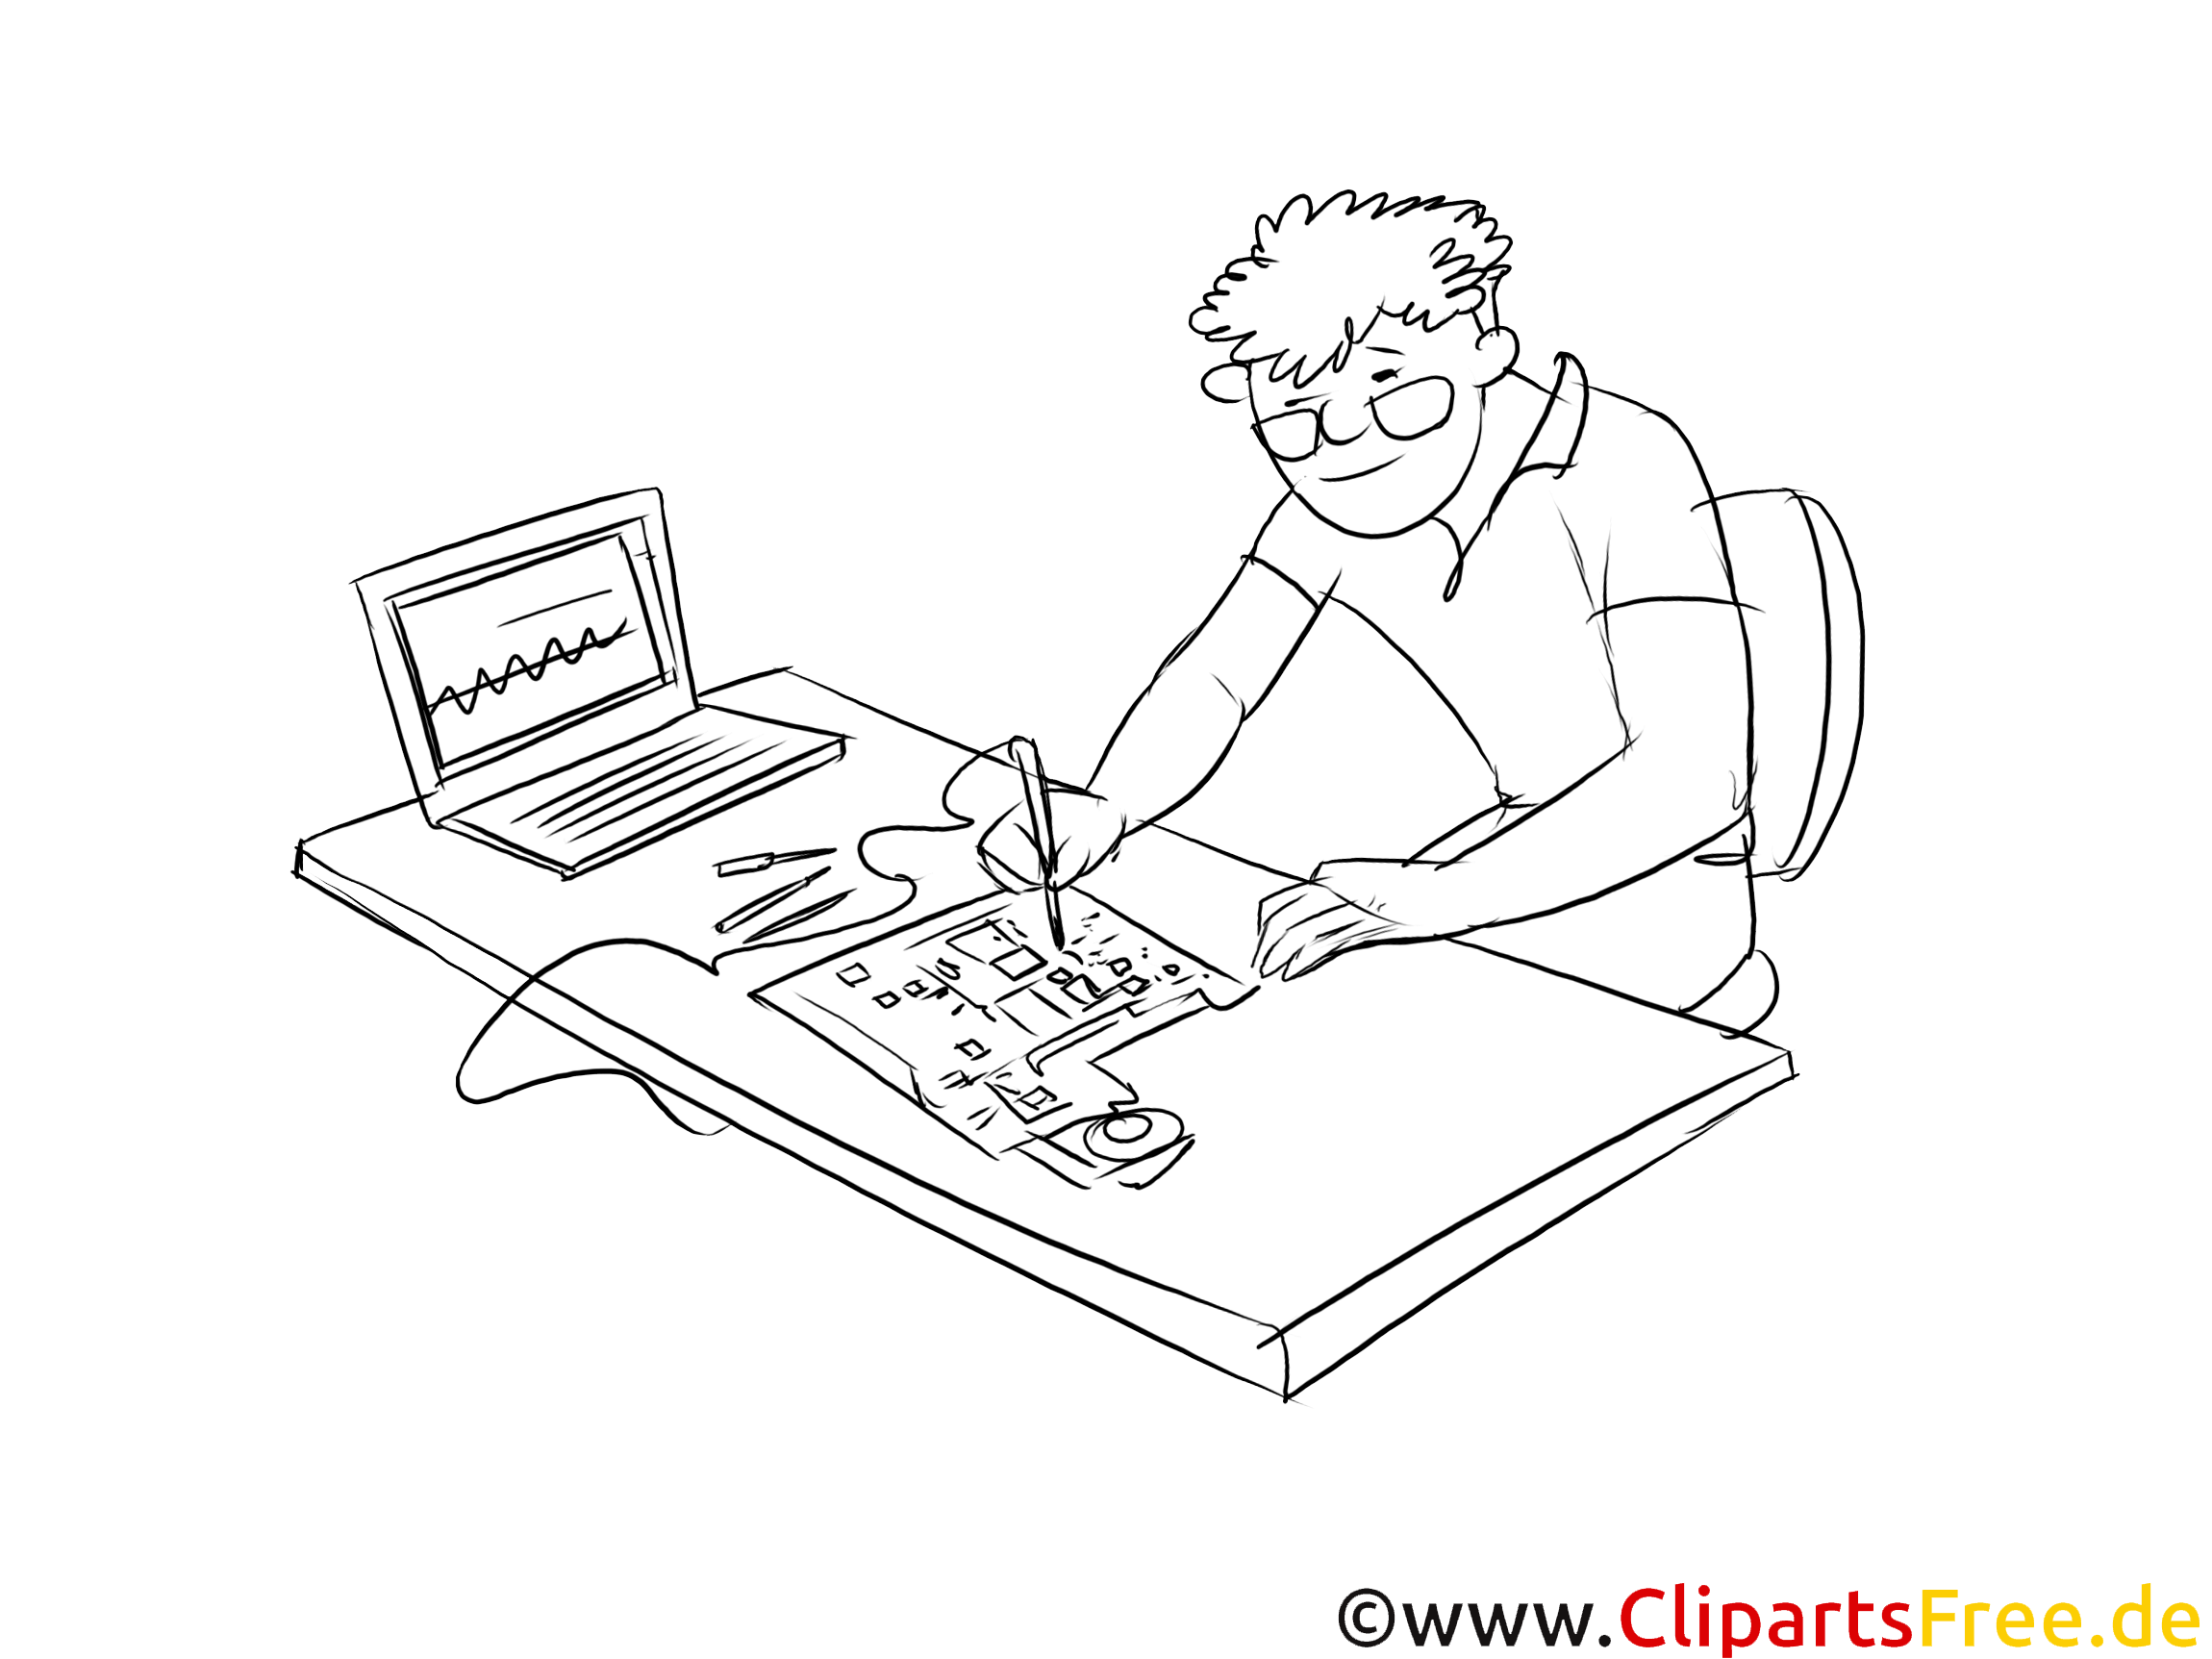 Elektrotechniker Clipart, Grafik, Bild schwarz-weiss